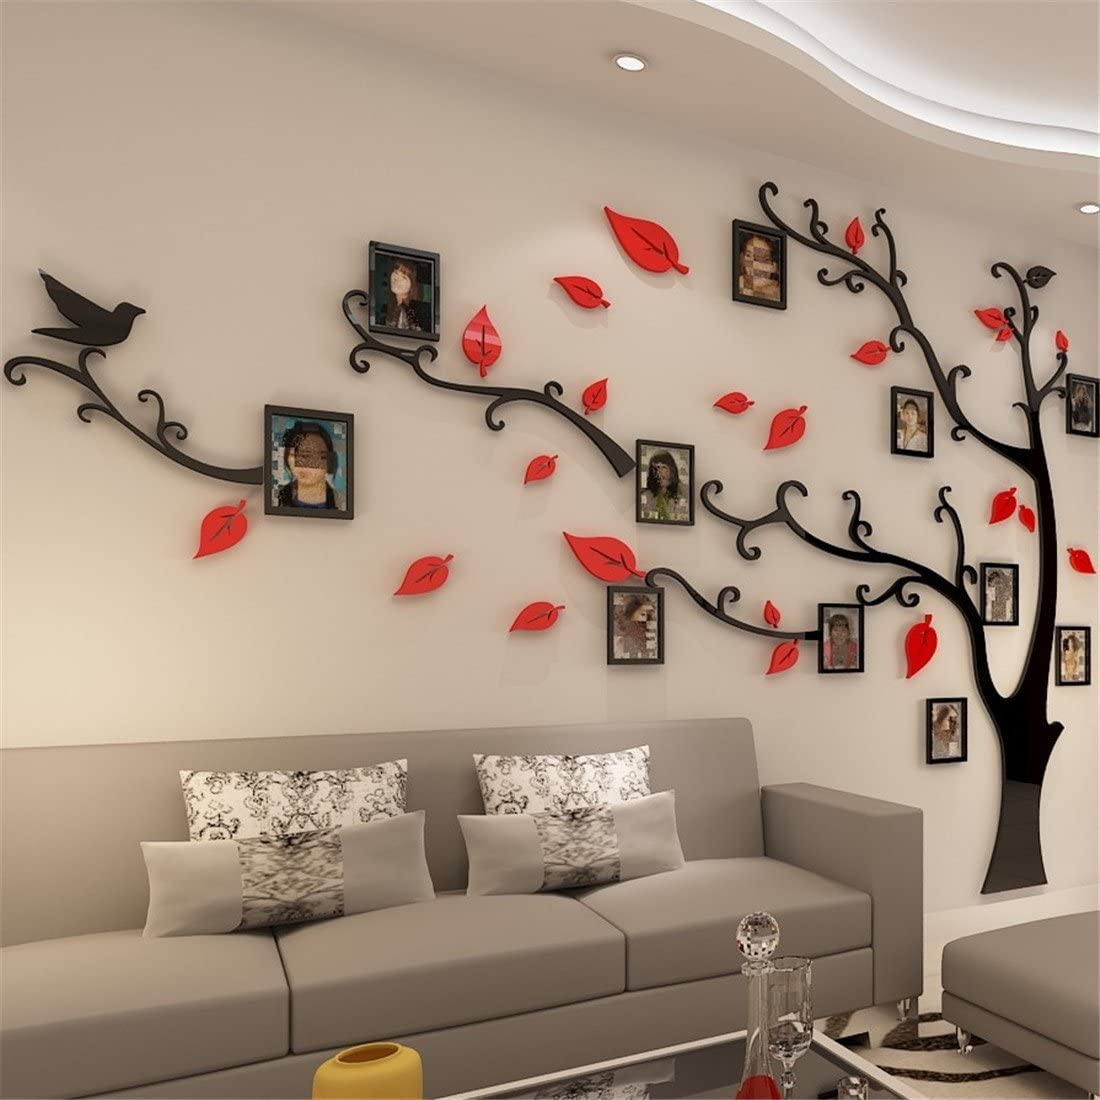 3D /Árbol Marco de Fotos DIY Etiqueta Murales Decoraci/ón para Sal/ón Pegatinas de Pared Dormitorio L: 175 * 230CM, Negro Derecha Oficina Habitaci/ón para Ni/ños